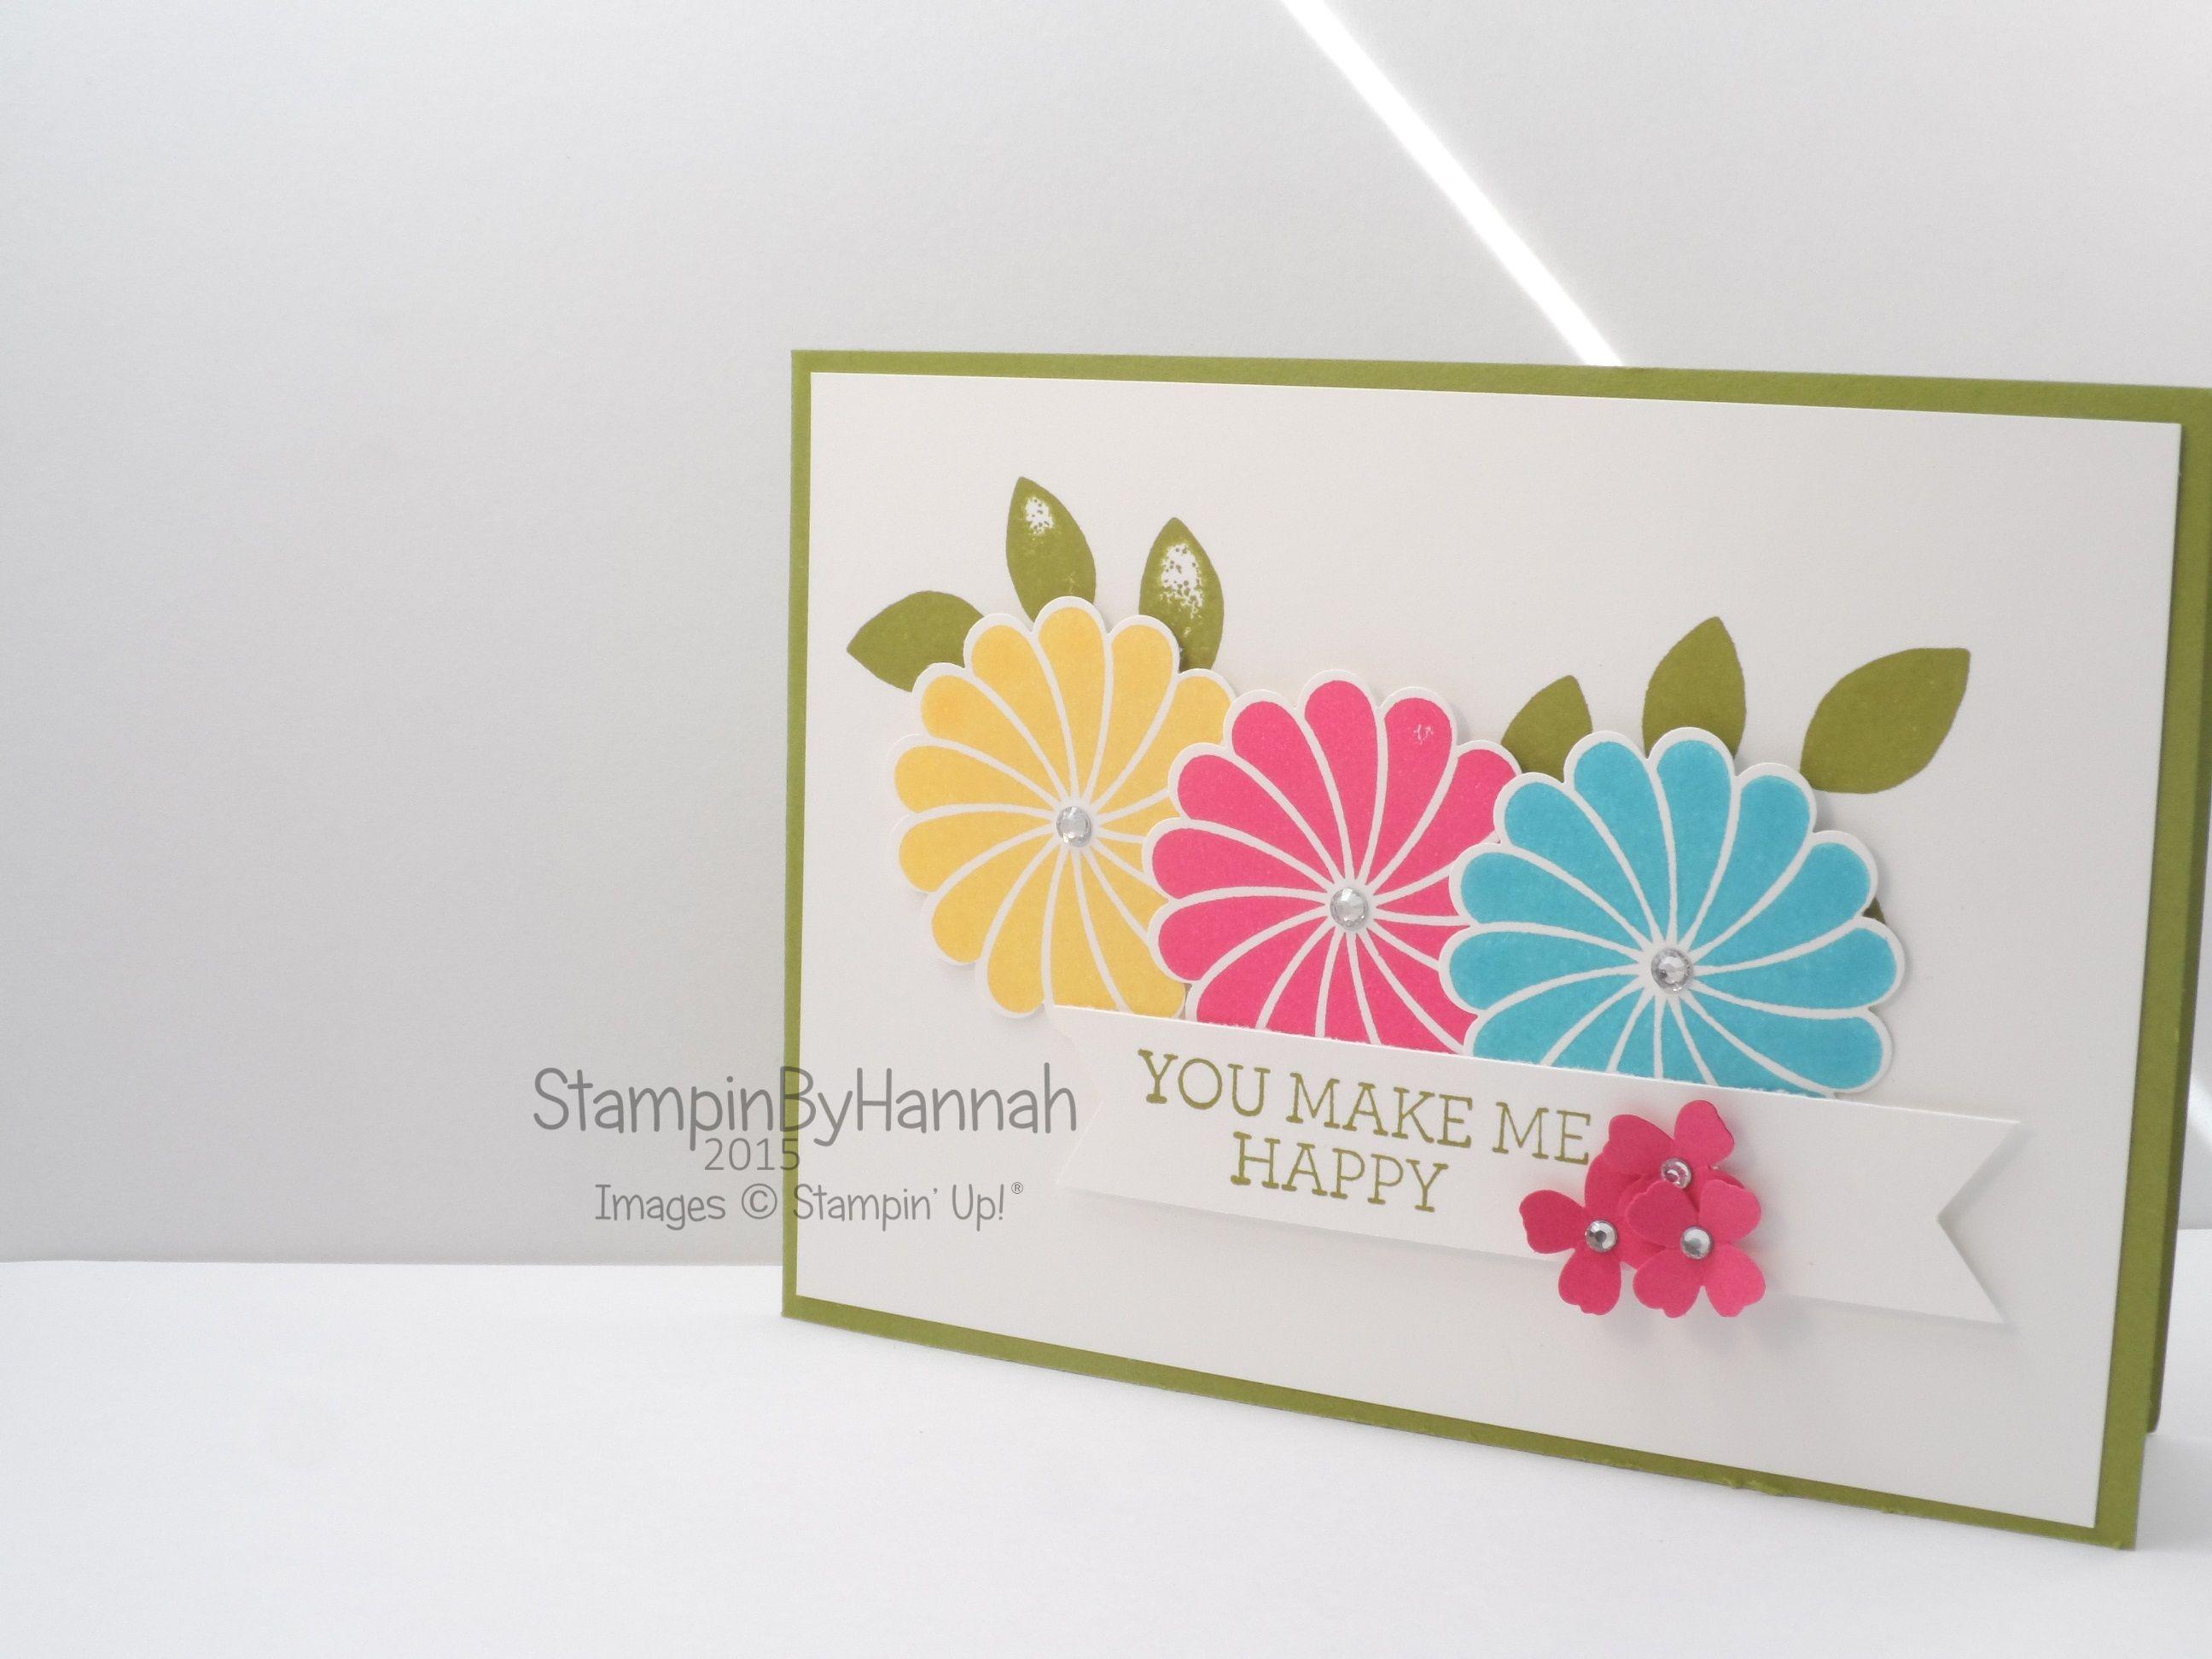 Stampinu up uk freshly make sketches cardmaking crazy about you